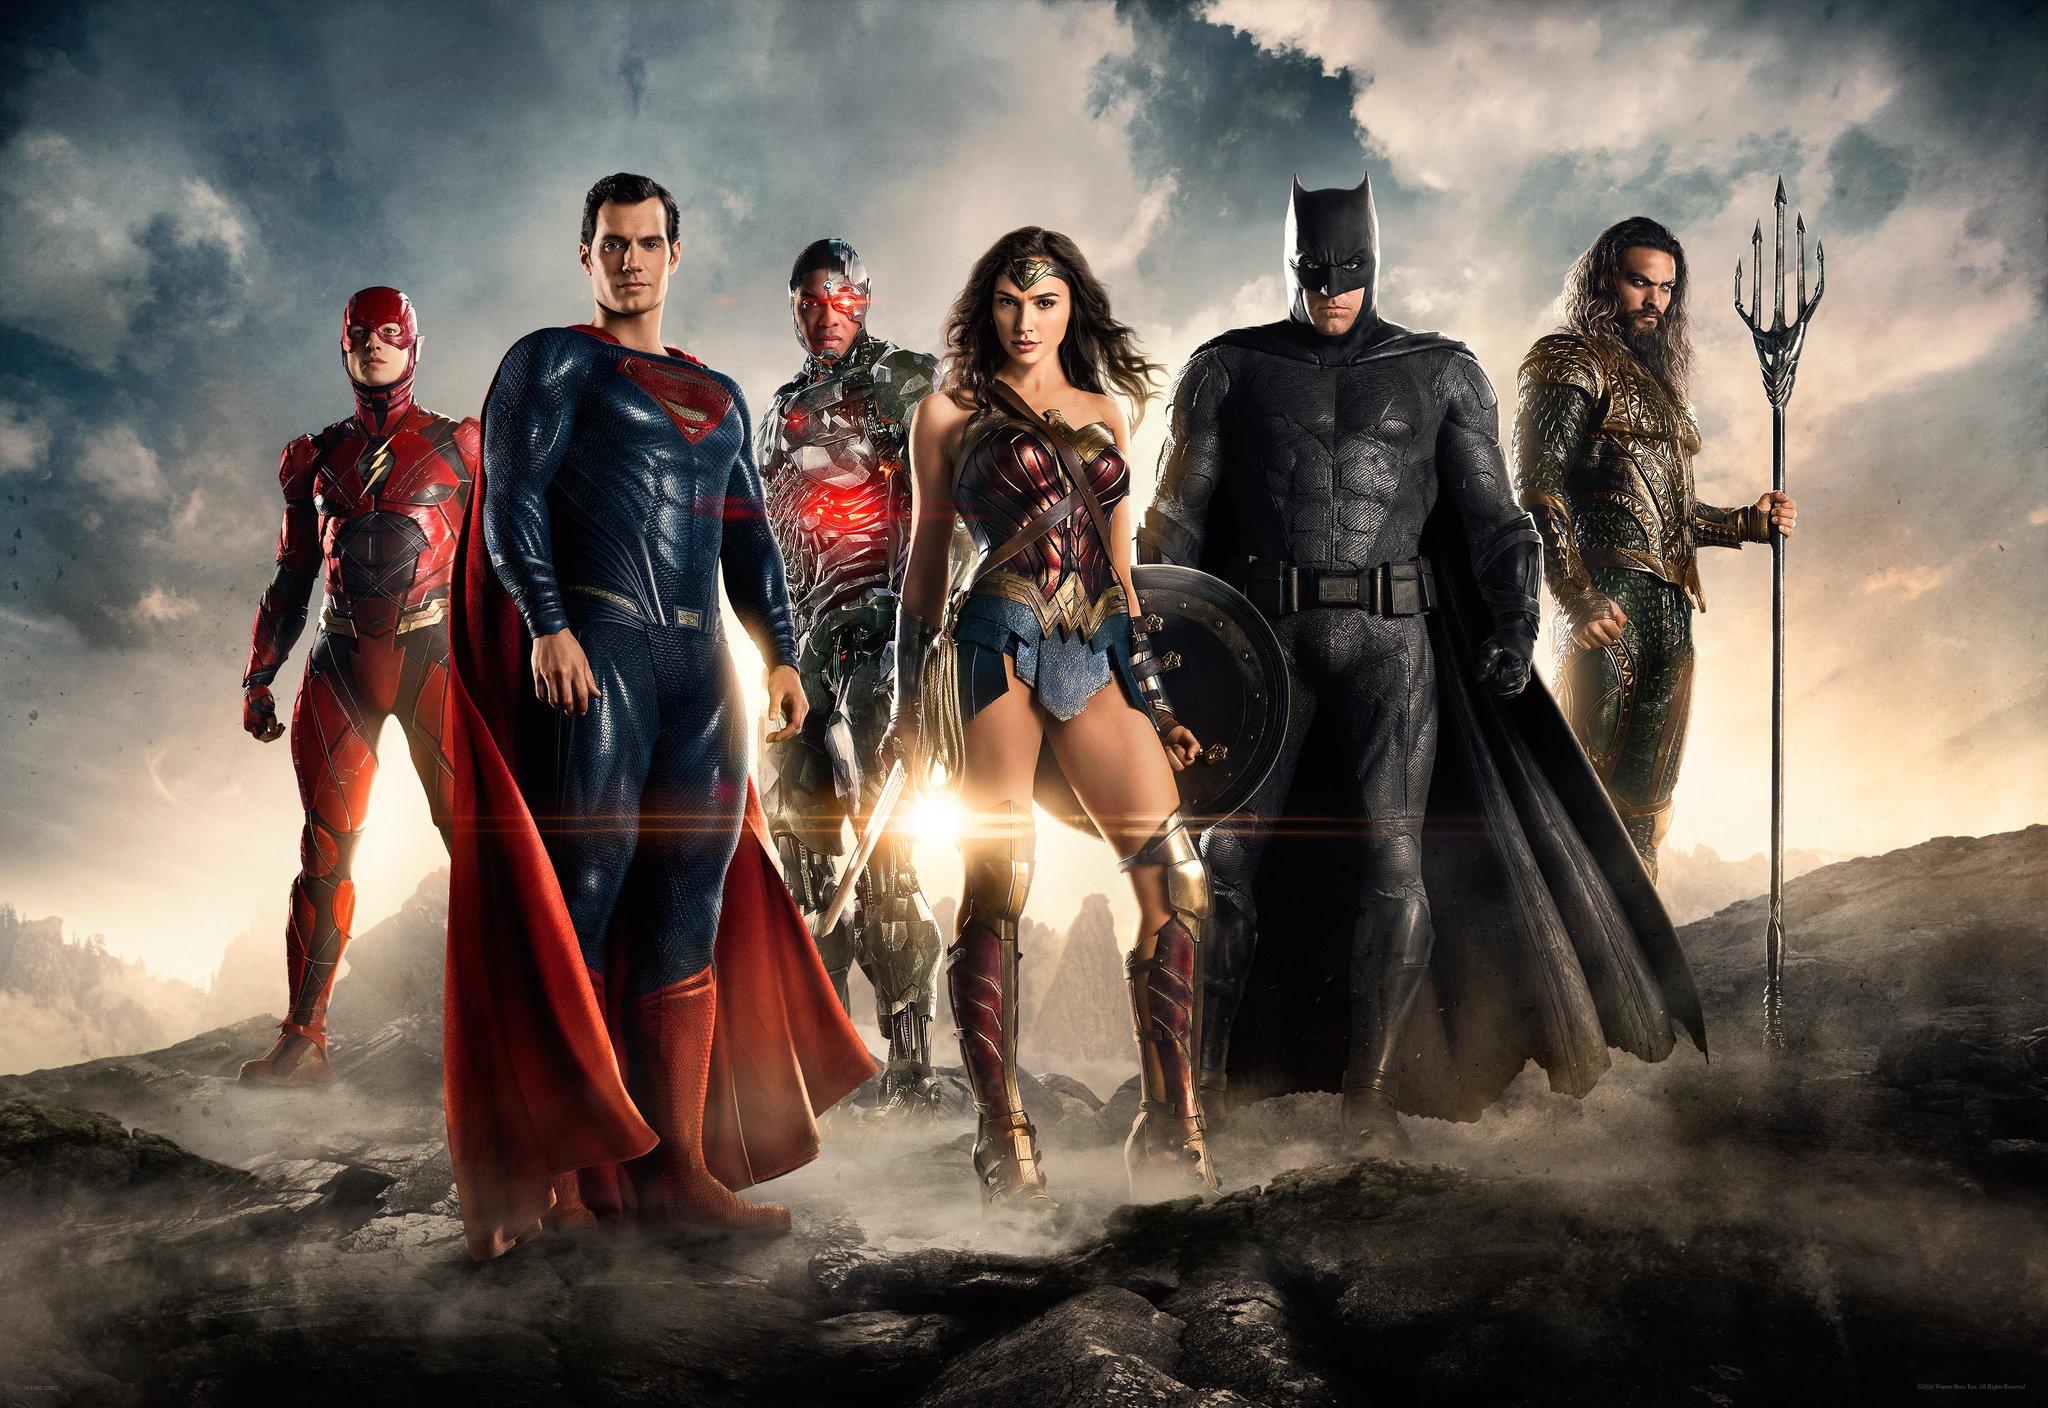 [ENCUESTA] ¿Cual película sera la mas taquillera del 2017? CoEjVGGVUAIDNSA